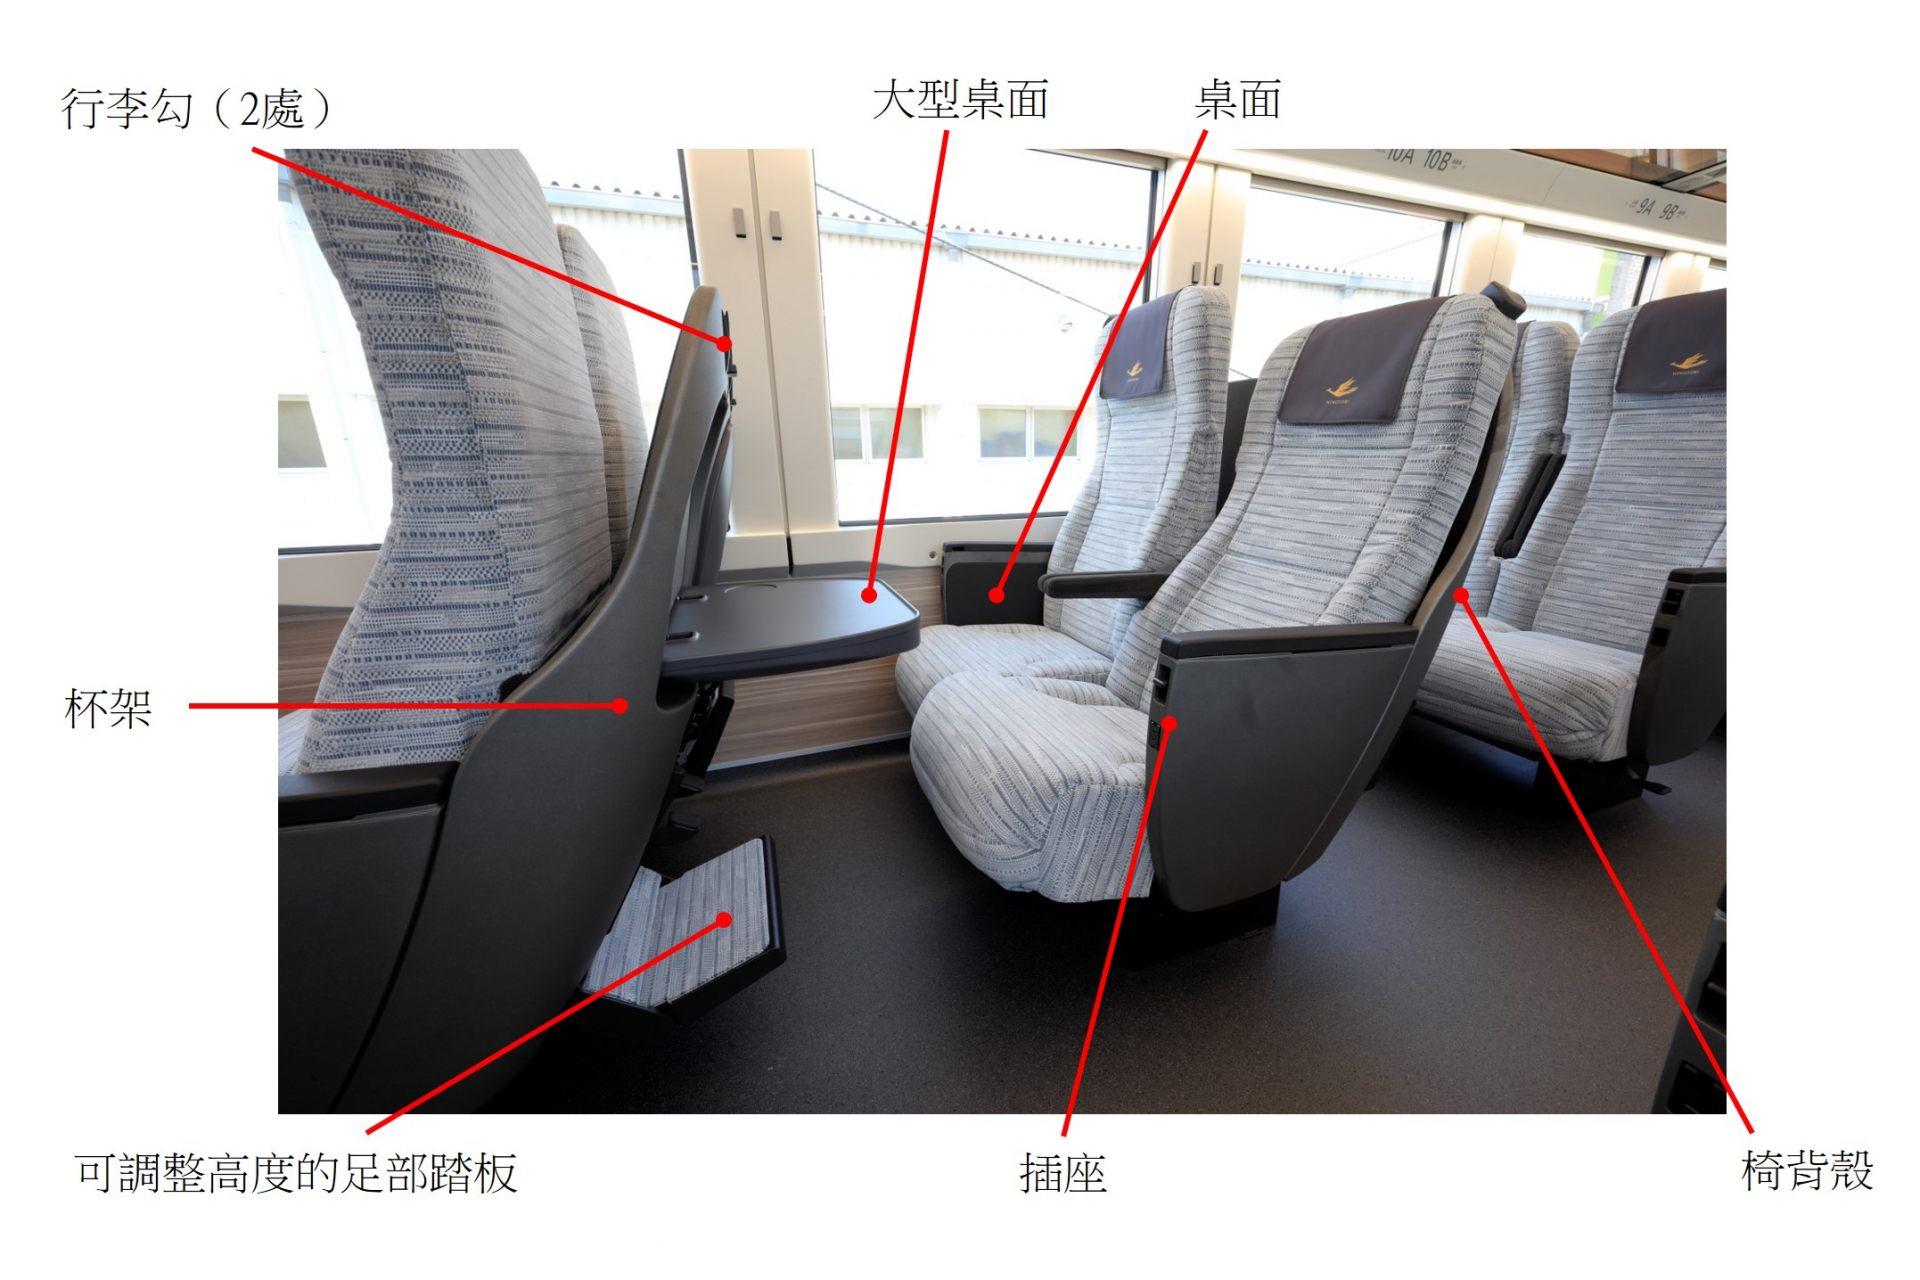 「HINOTORI」標準車廂的座位